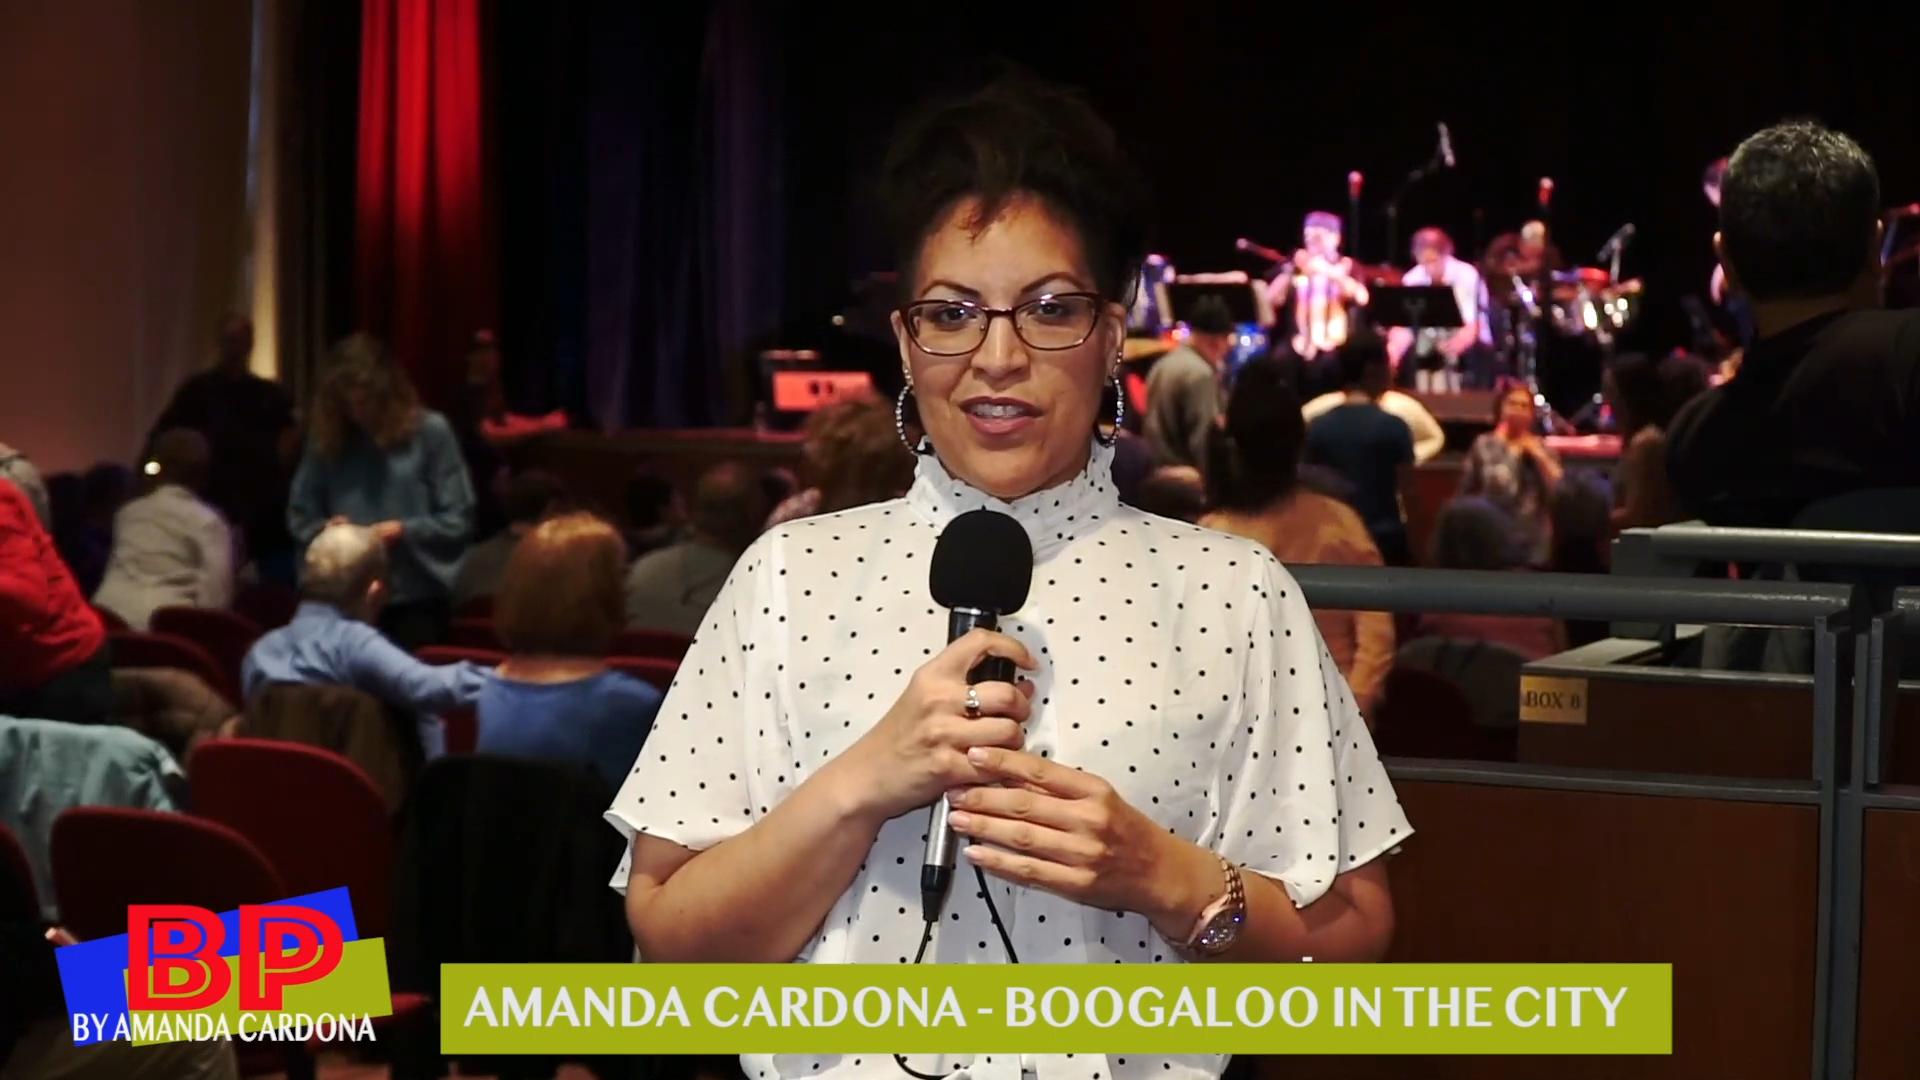 Amanda Cardona